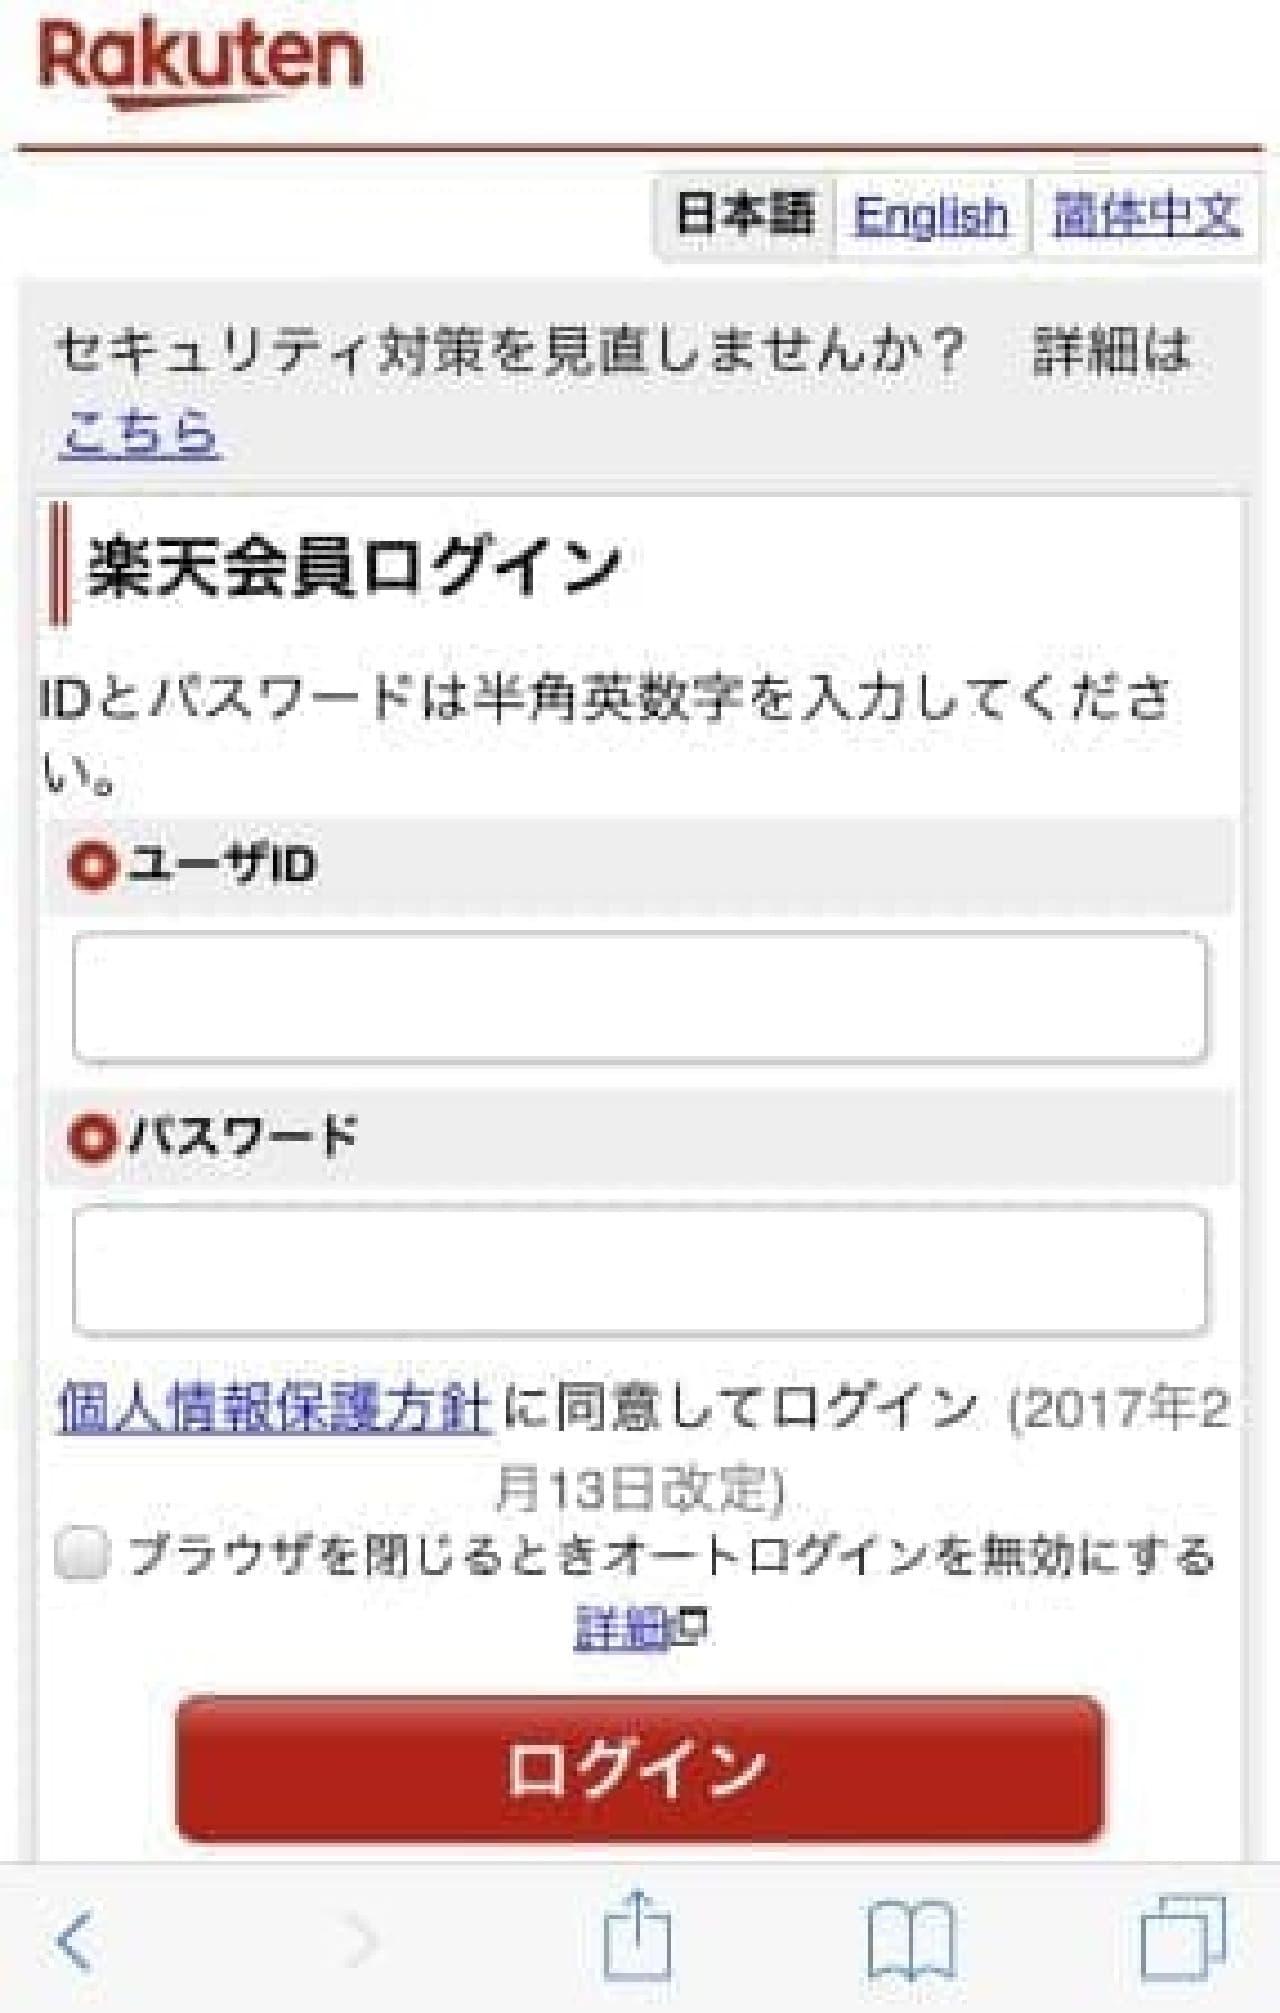 Webサイトのログイン画面